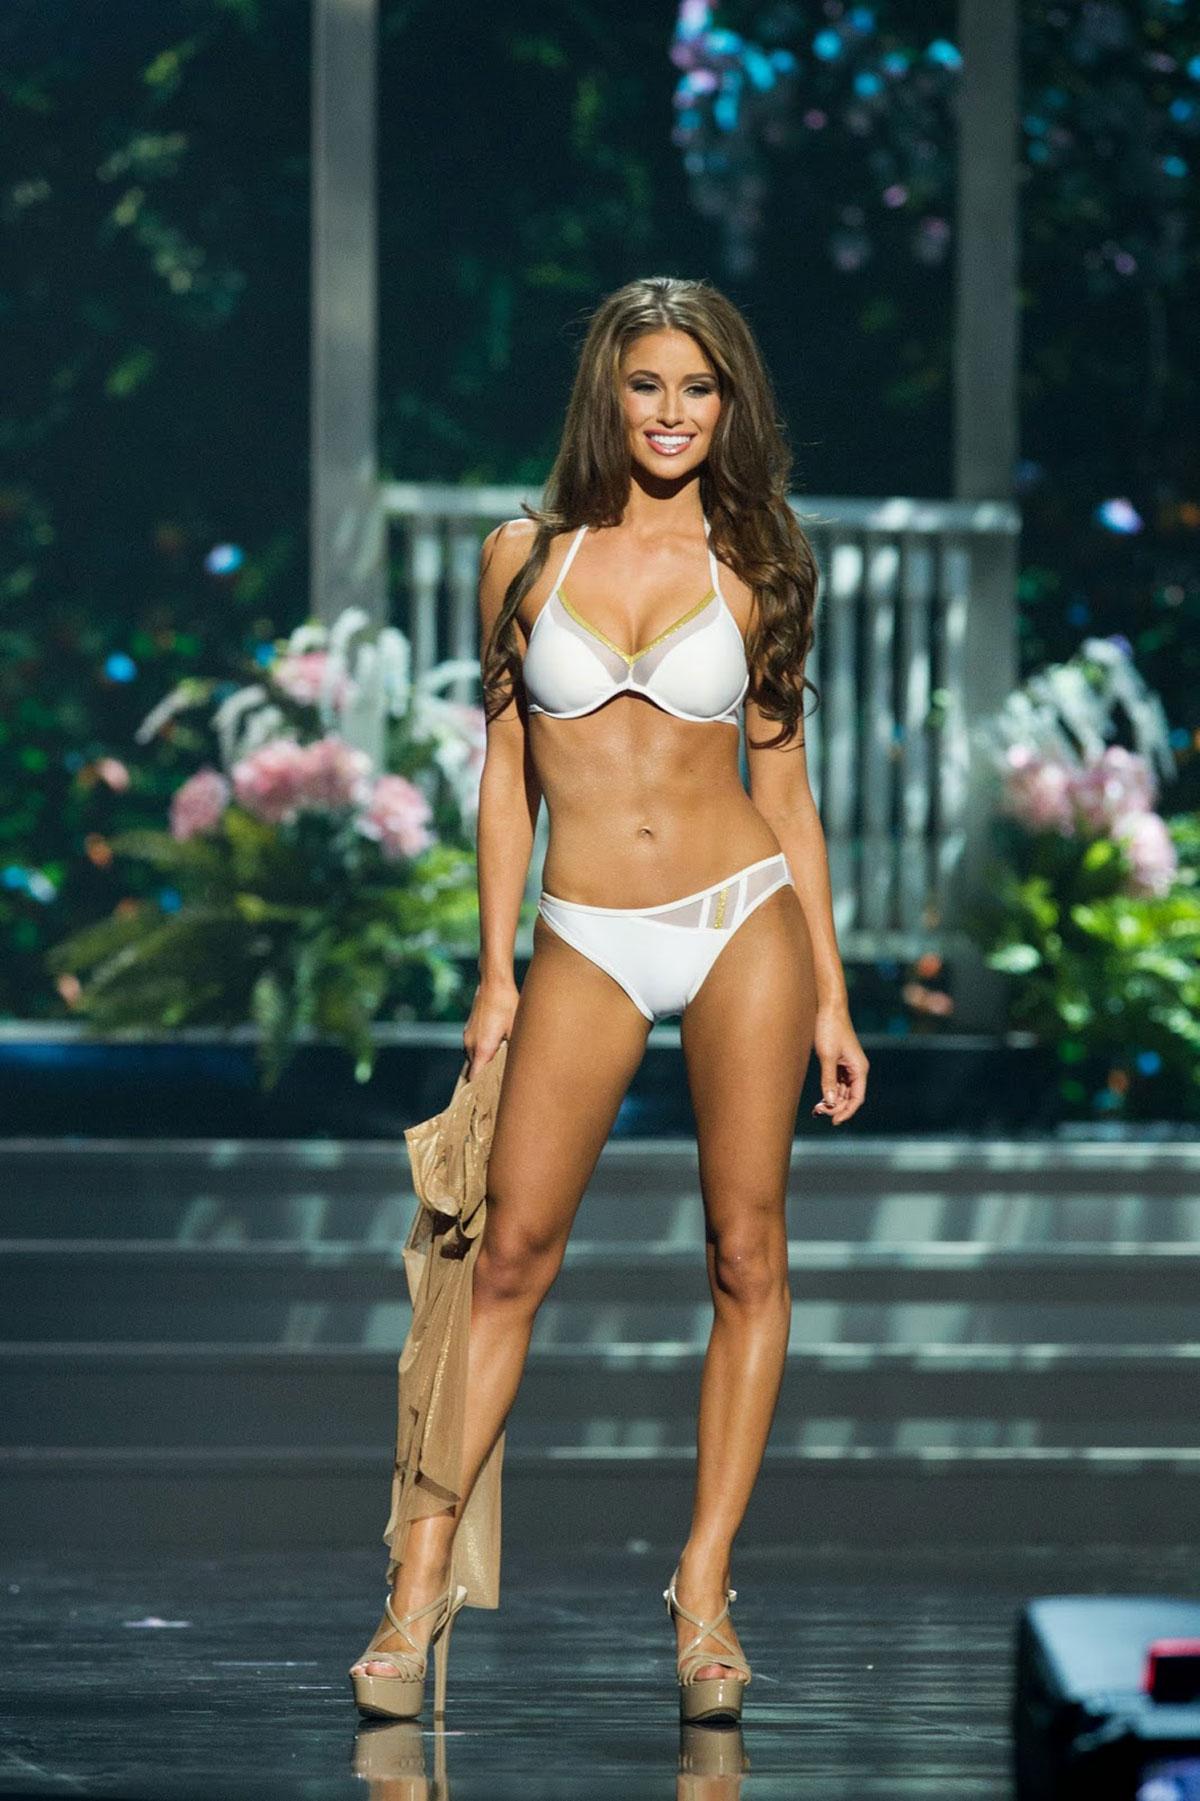 Bikini Nia Sanchez nudes (36 photo), Ass, Is a cute, Selfie, braless 2015